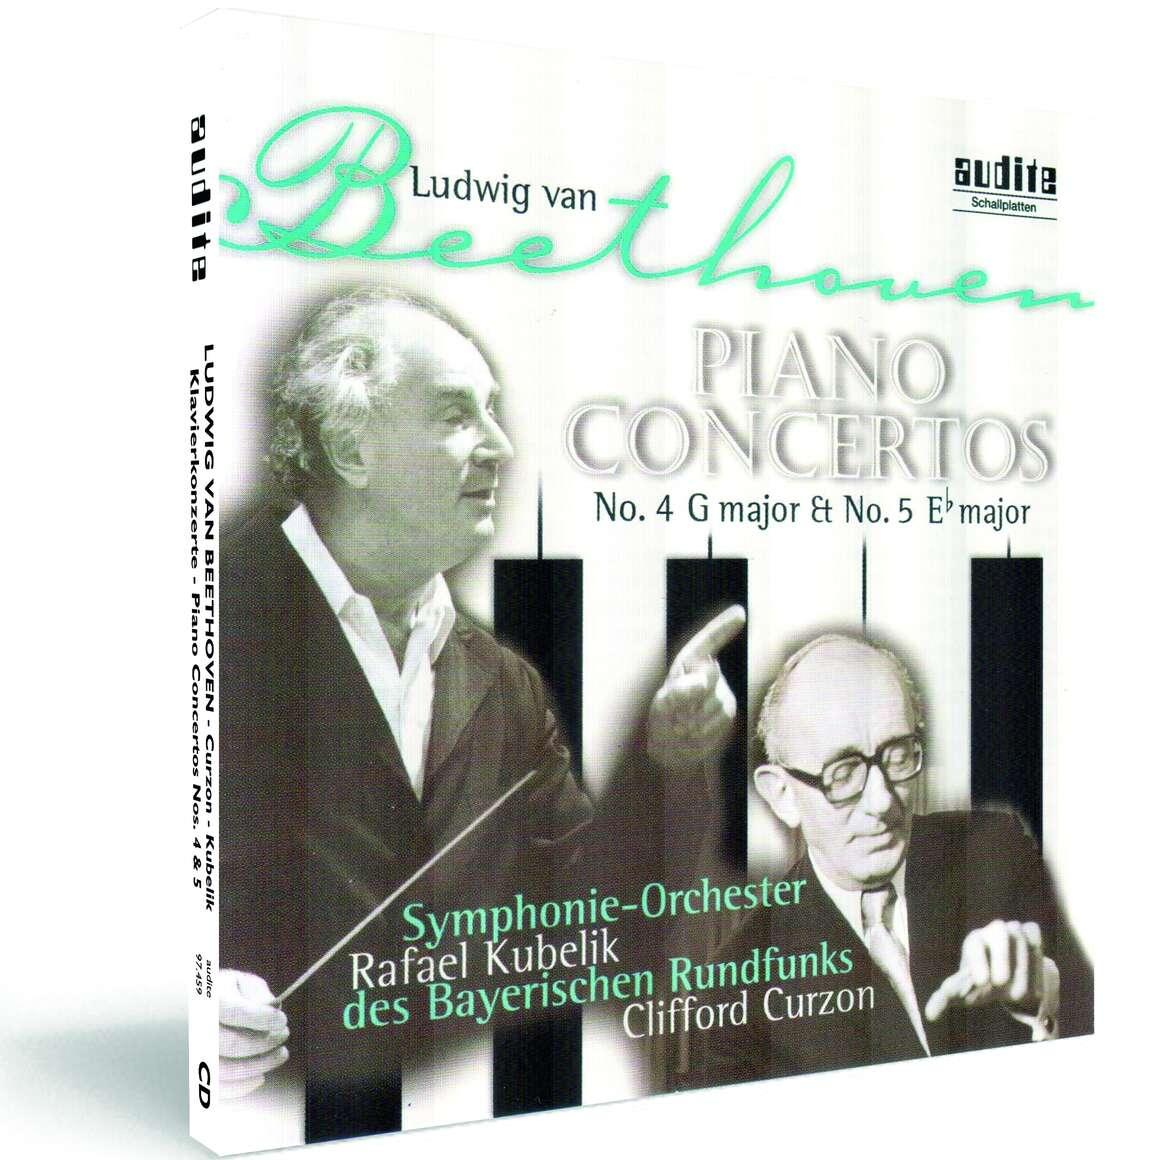 L. v. Beethoven: Piano Concertos No. 4 & No. 5